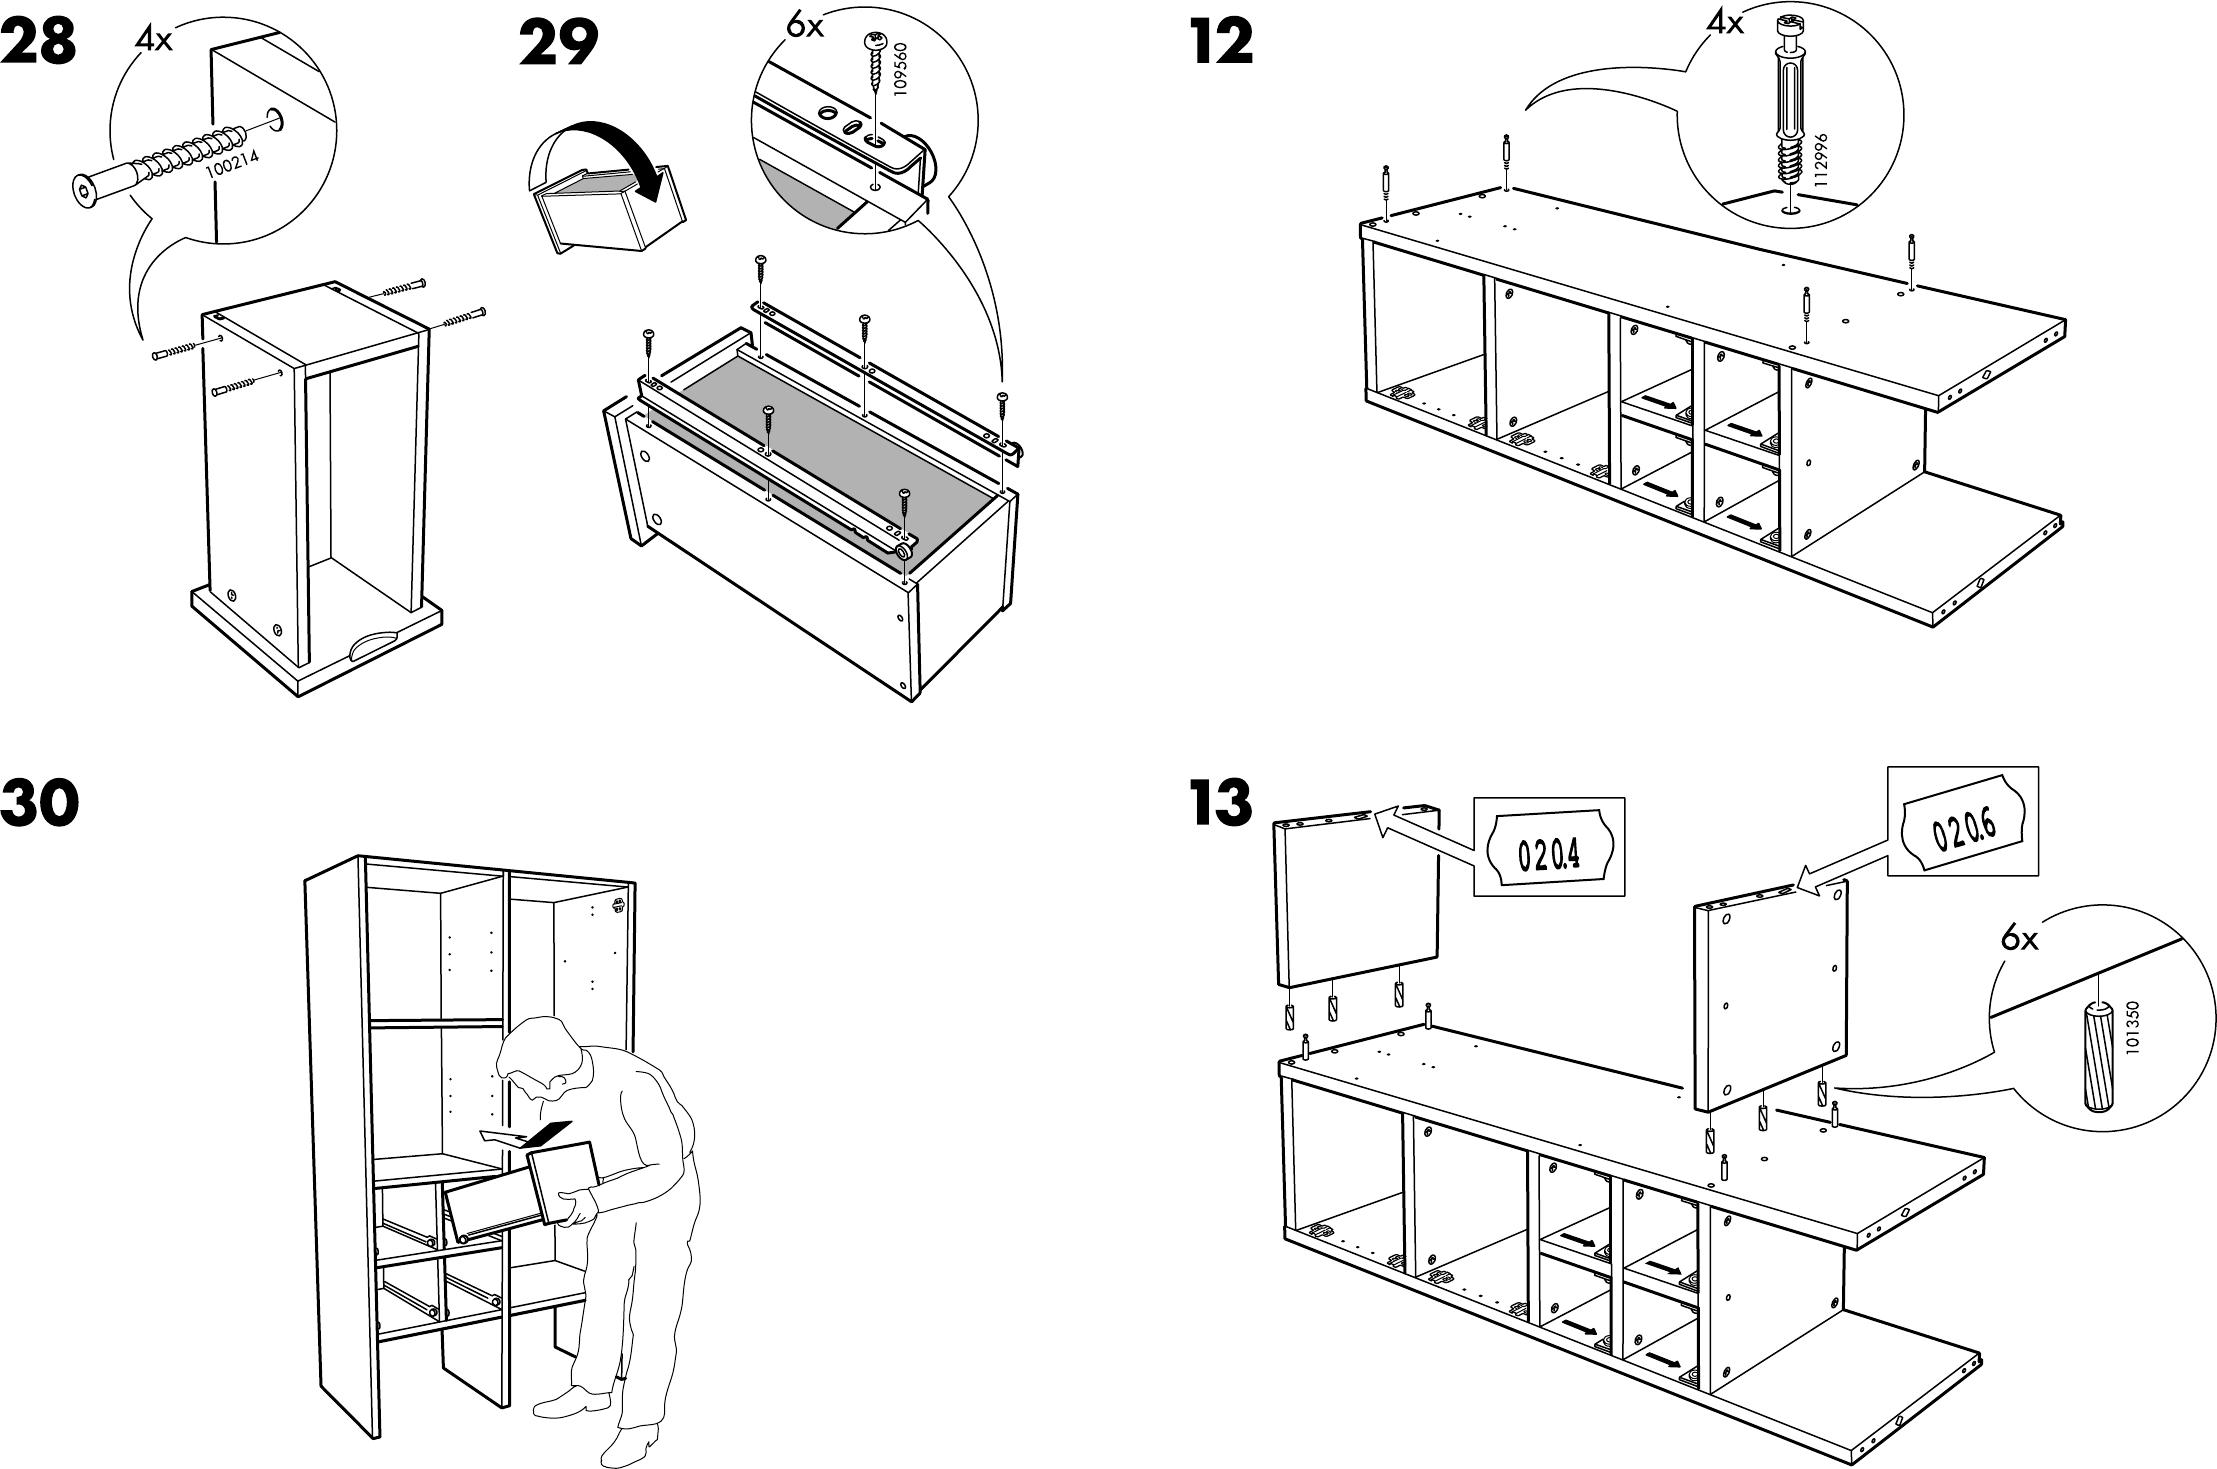 Handleiding Ikea Rakke Kast Pagina 9 Van 12 Dansk